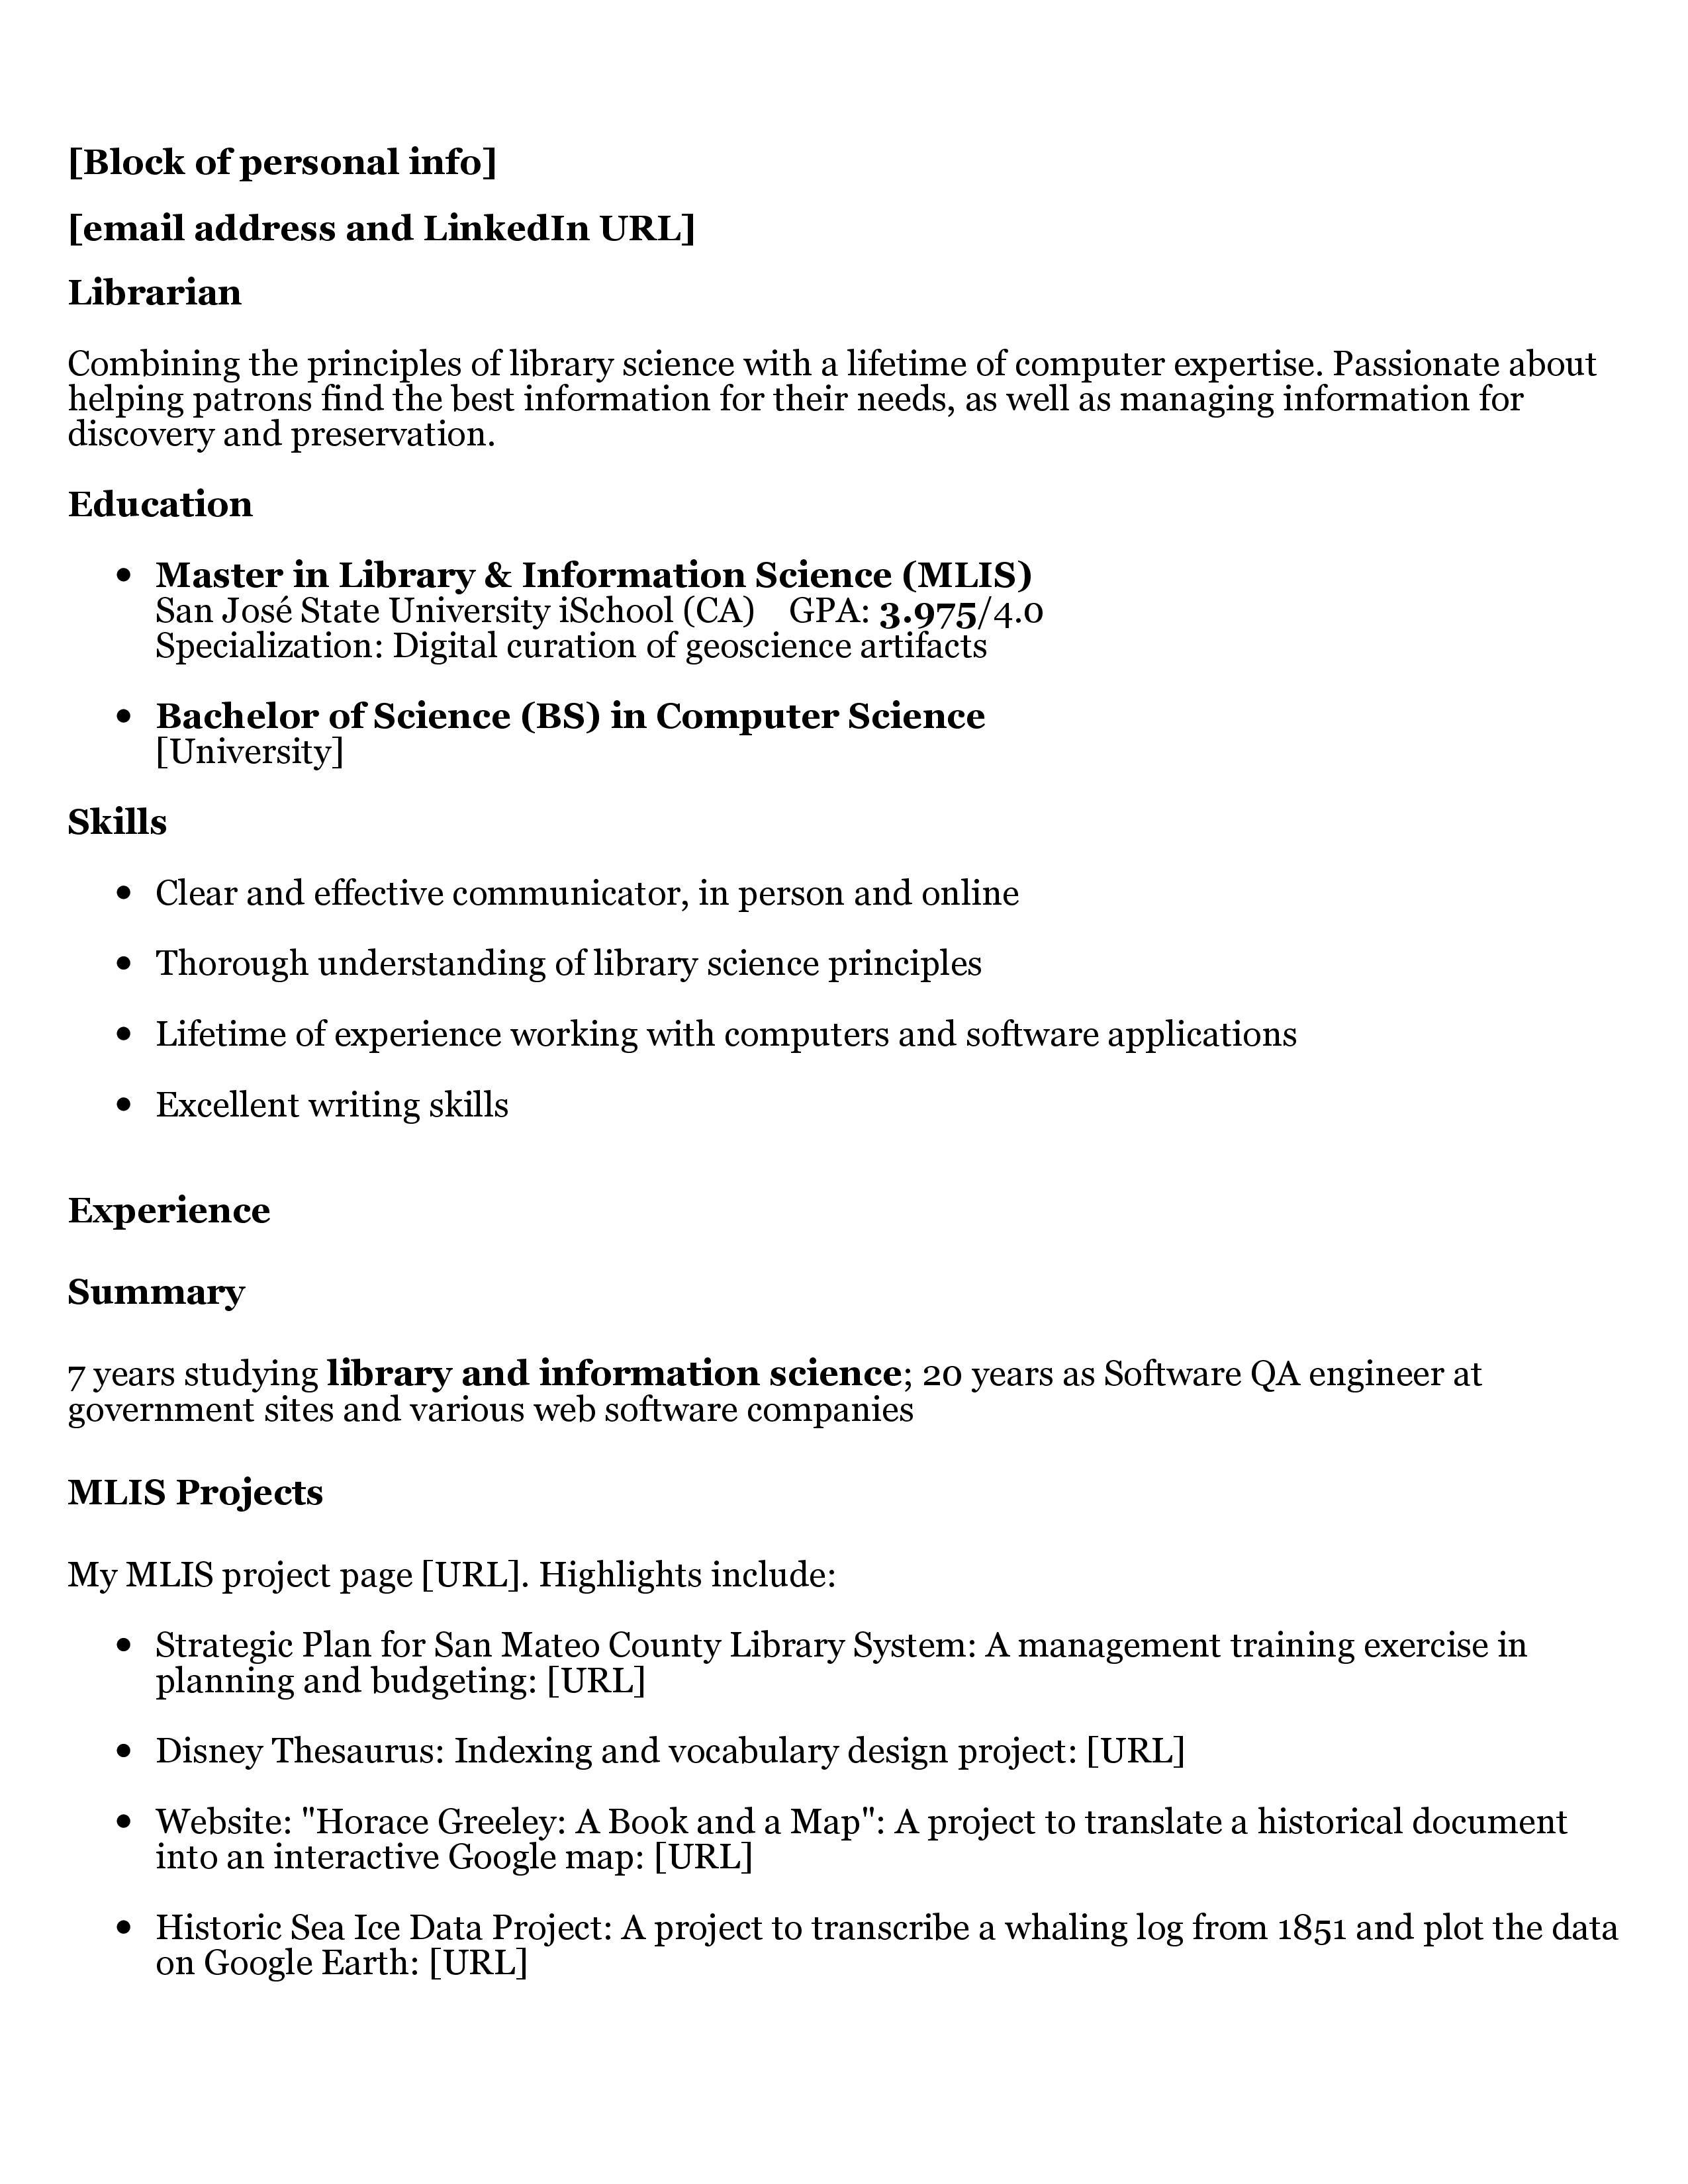 Worksheet For Making A Resume